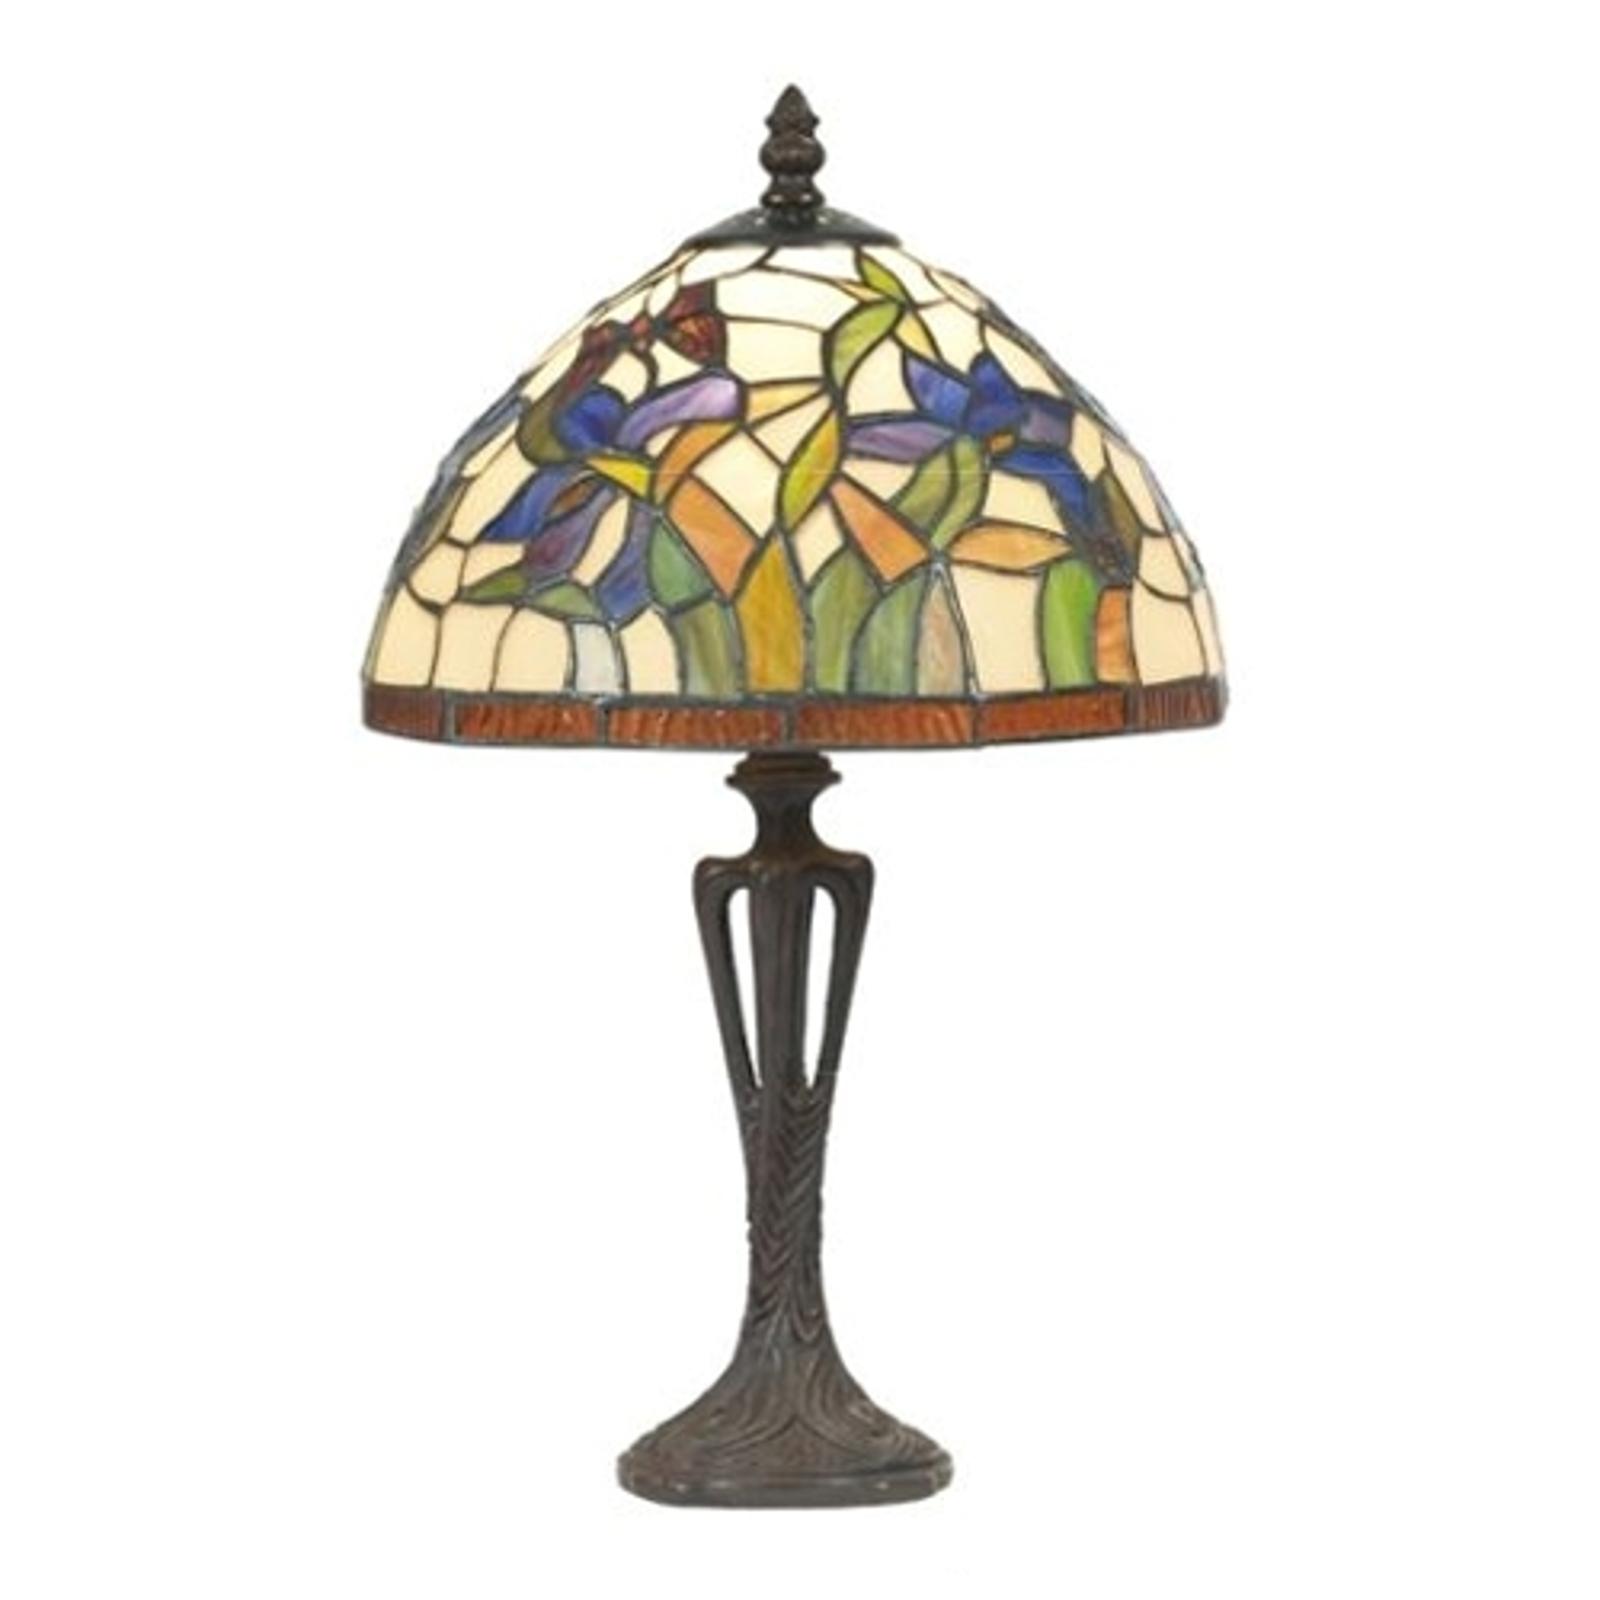 Decentná stolná lampa ELANDA v štýle Tiffany 41cm_1032161_1